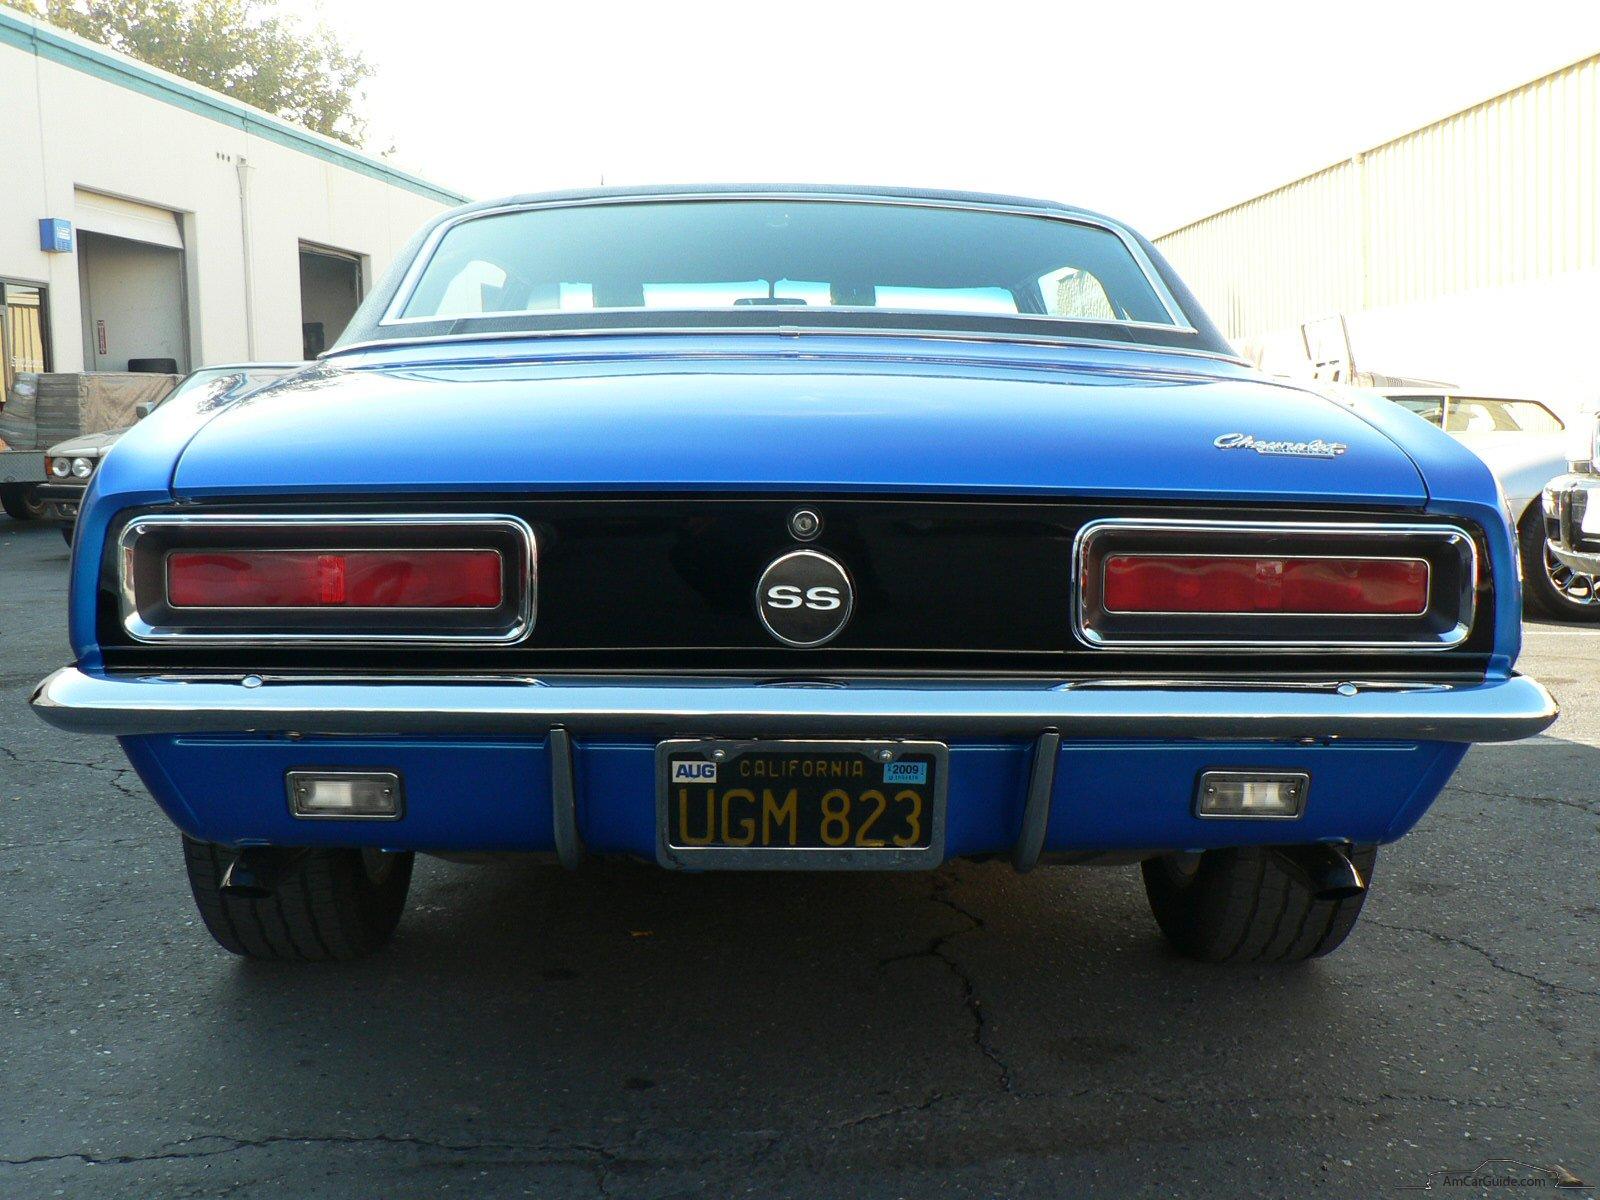 Chevrolet Camaro I 1967 - 1969 Coupe #1